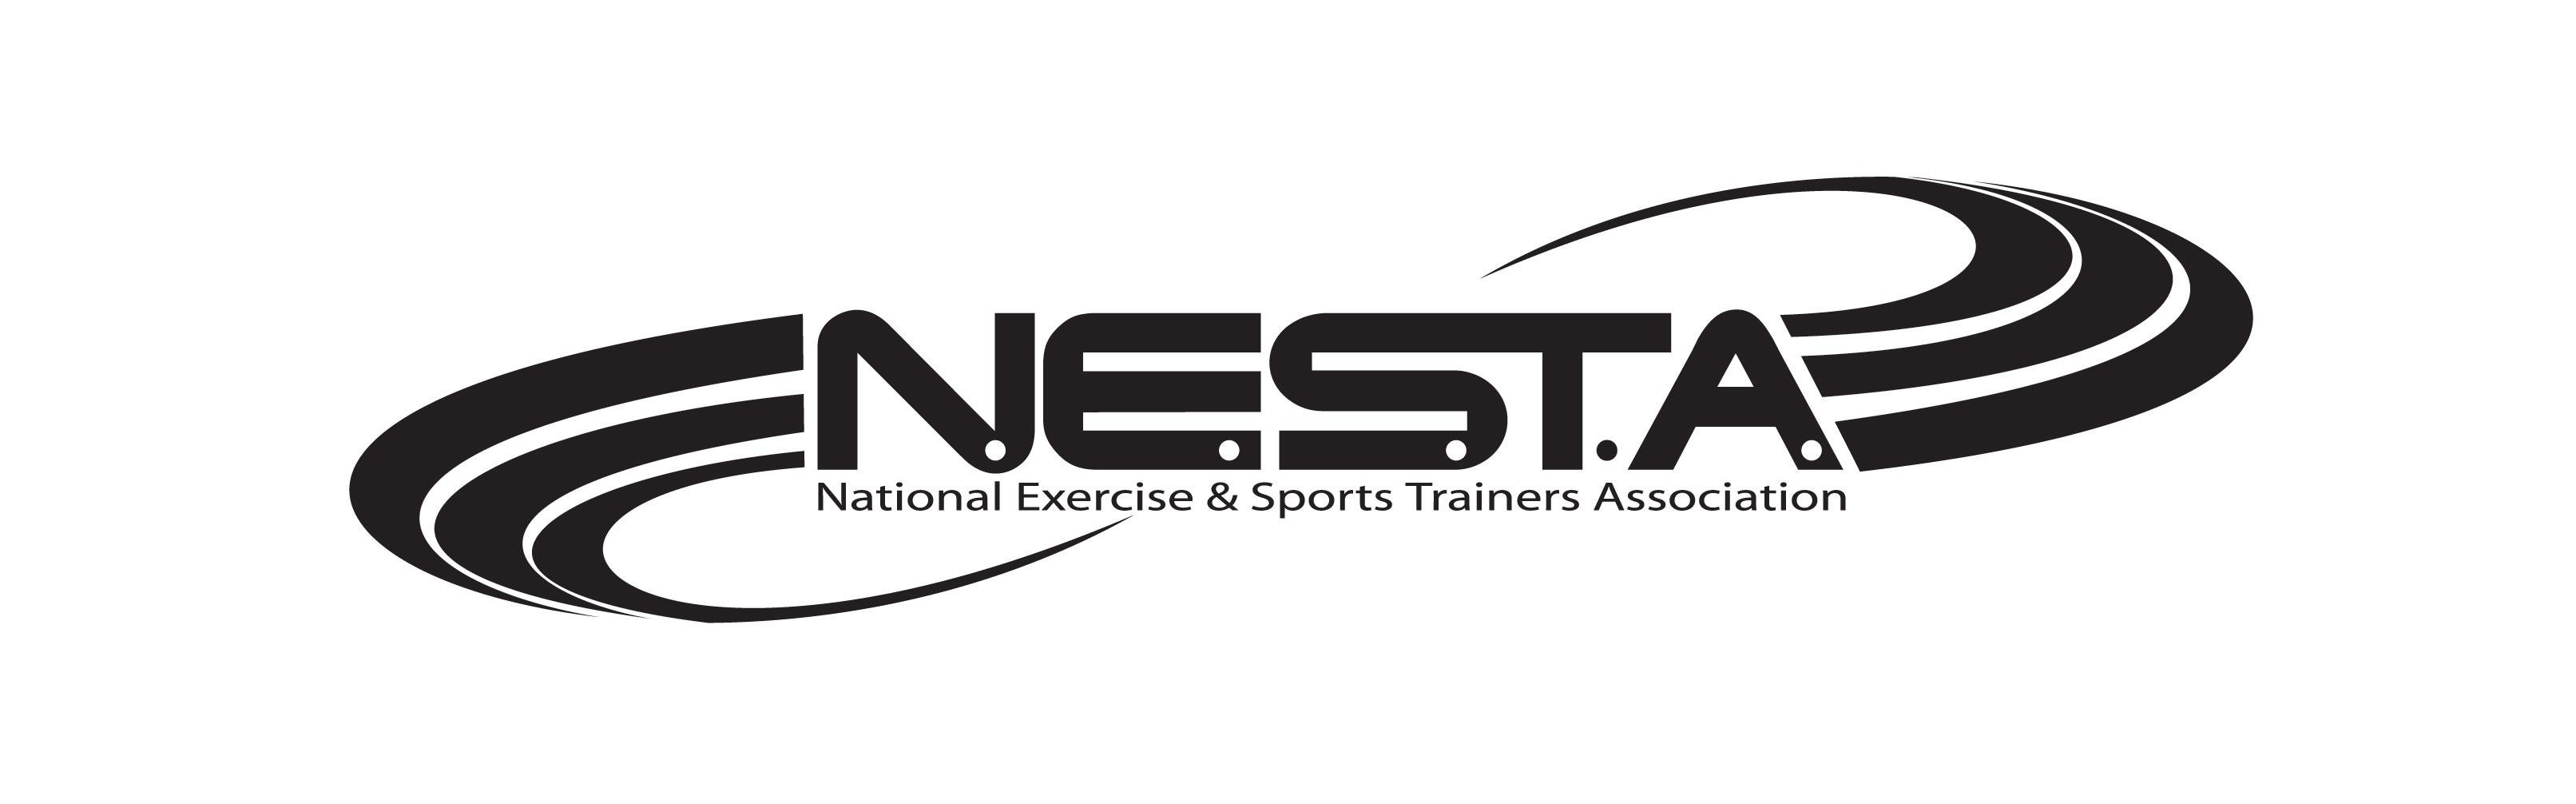 National Exercise Sports Trainers Association Celebrates 20 Years